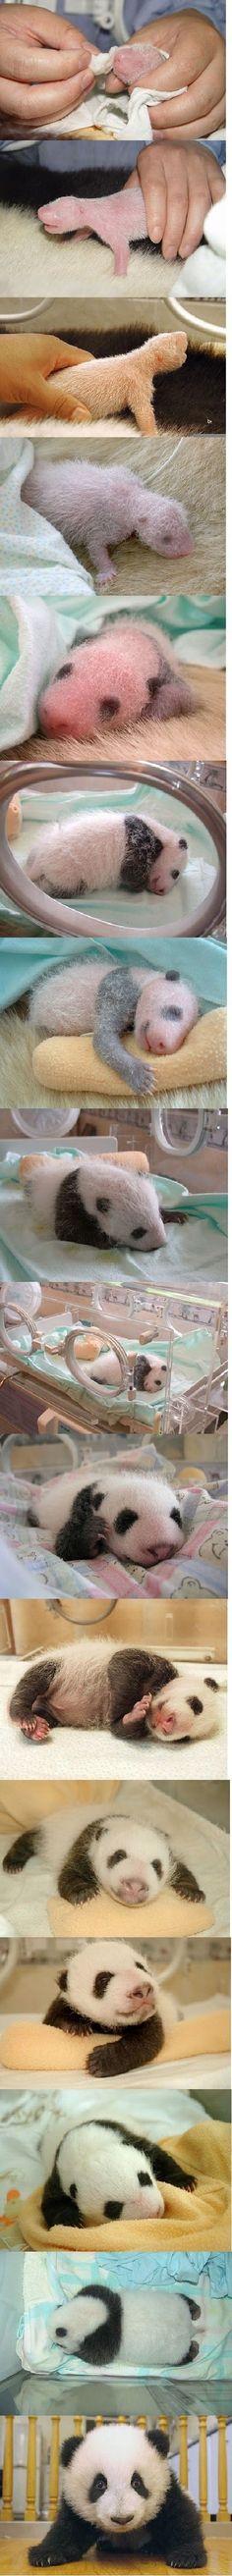 I love Pandas!